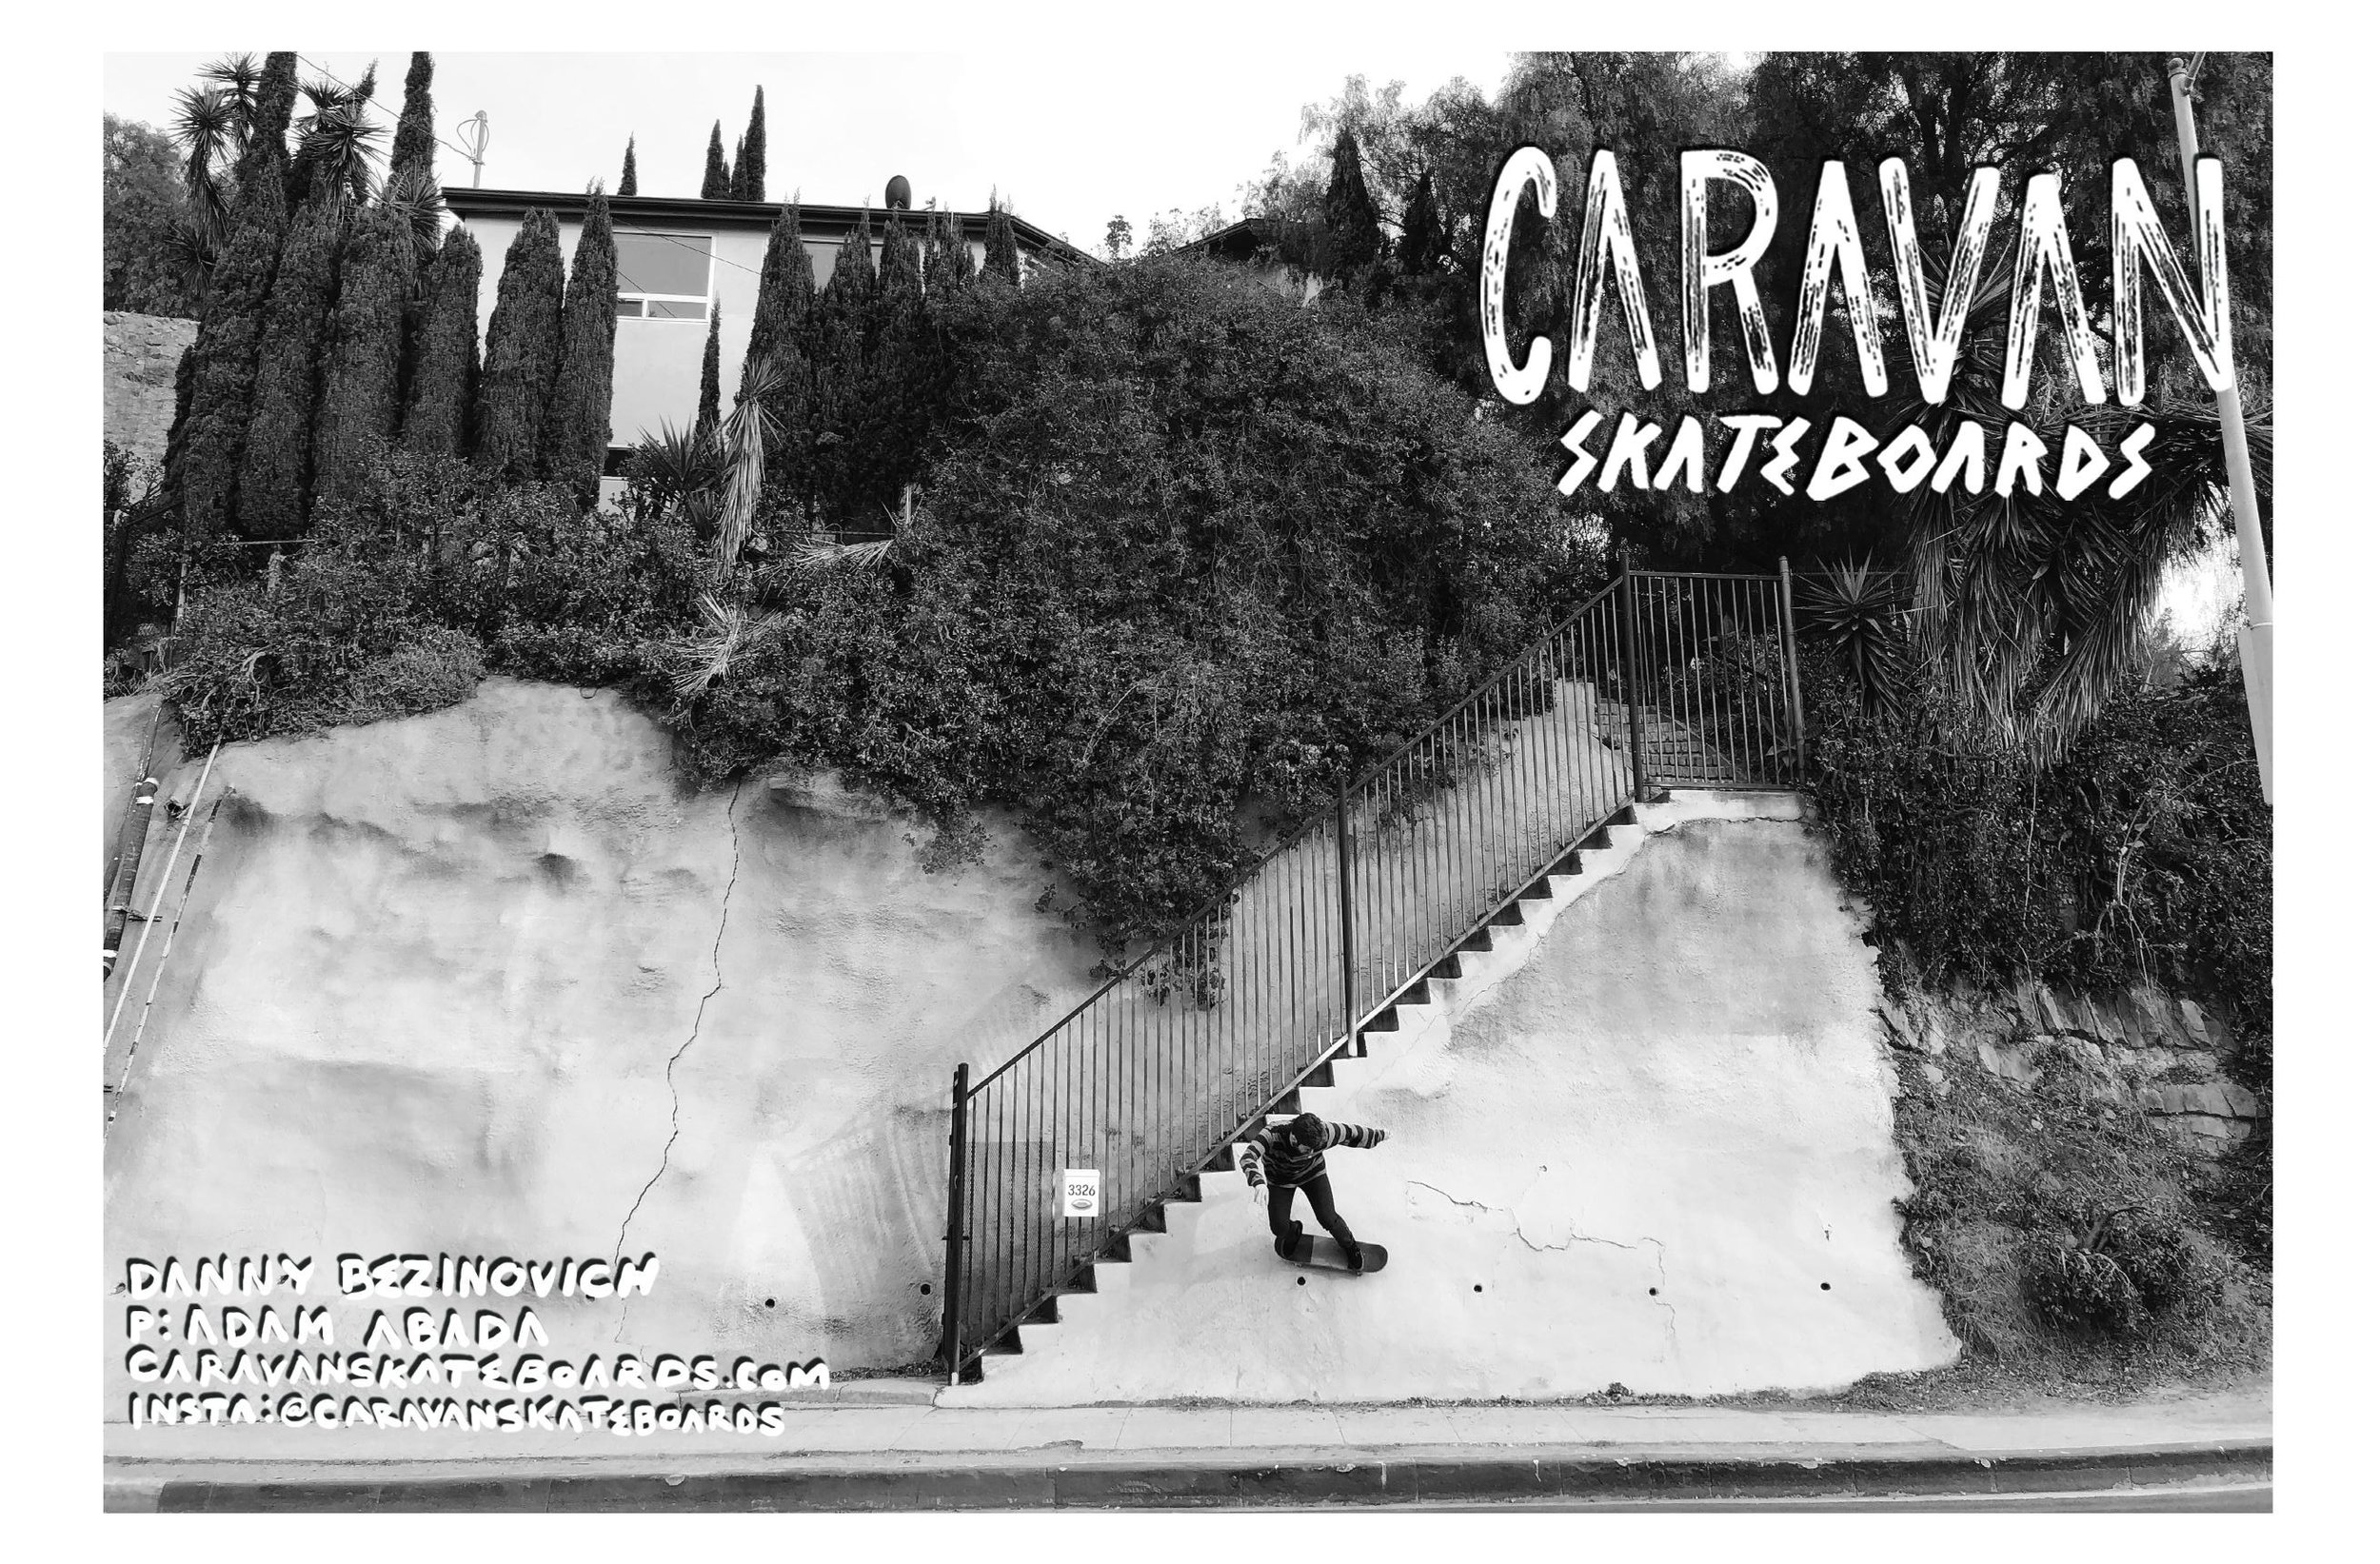 SkateJawnJan18_Caravan_LAWallride_DannyAdam.jpg